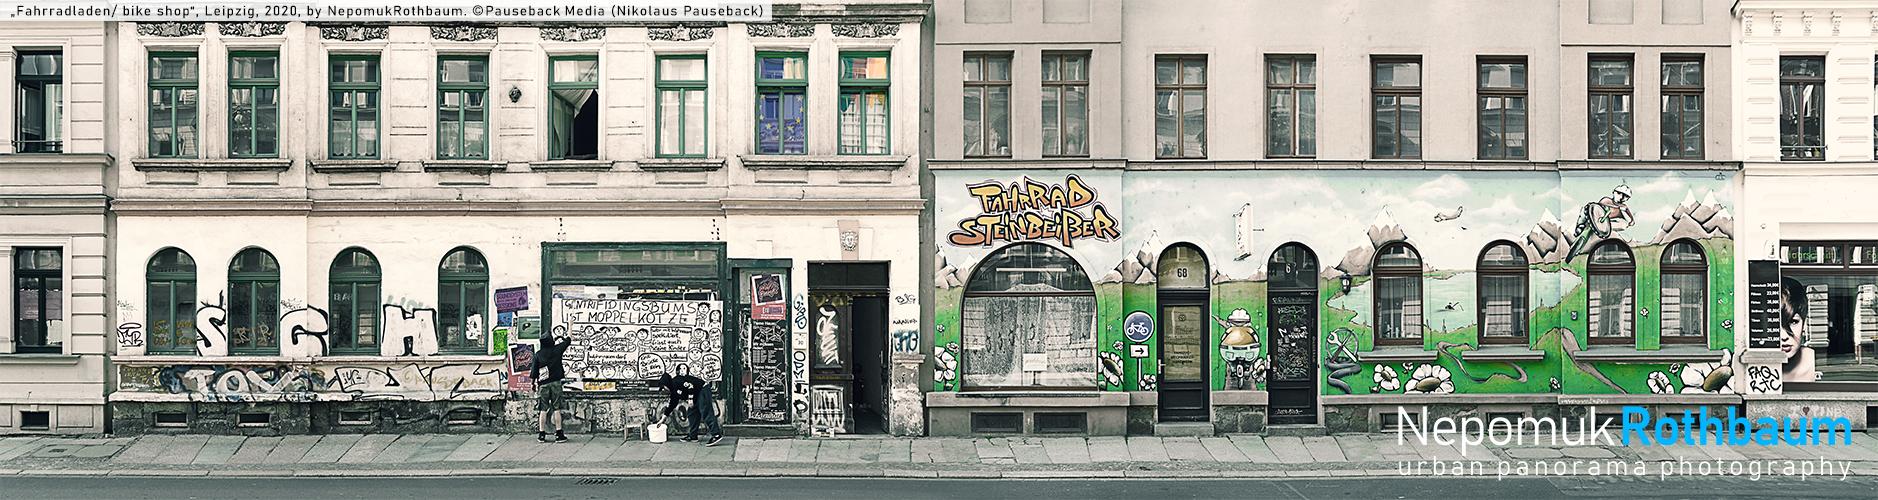 Farradladen / bike shop, Leipzig 2020, by Nepomuk Rothbaum, © Pauseback Media (Nikolaus Pauseback) 2020